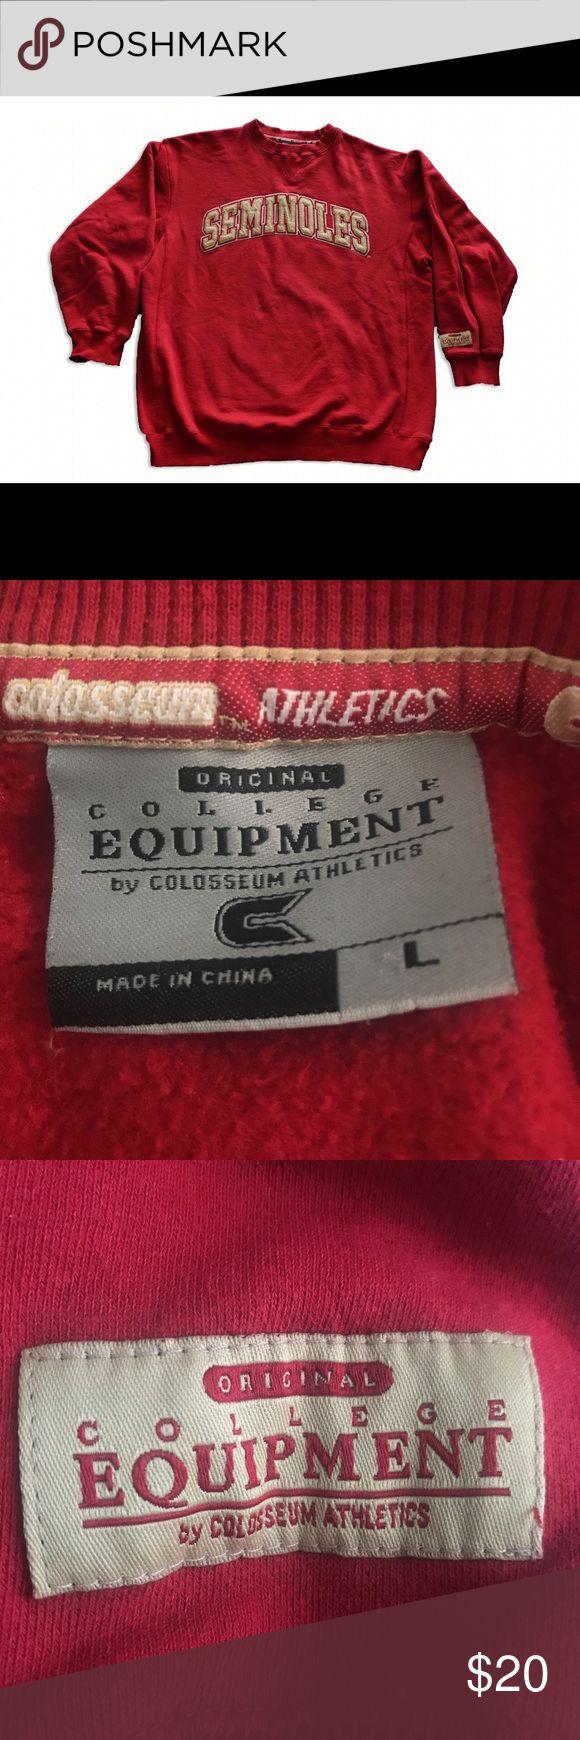 College Vintage Florida State Seminoles Sweater College Equipment by Colosseum Athletics Vintage Florida State Seminoles Sweater Pullover. Fits true to size. College Equipment by Colosseum Athletics Sweaters Crewneck